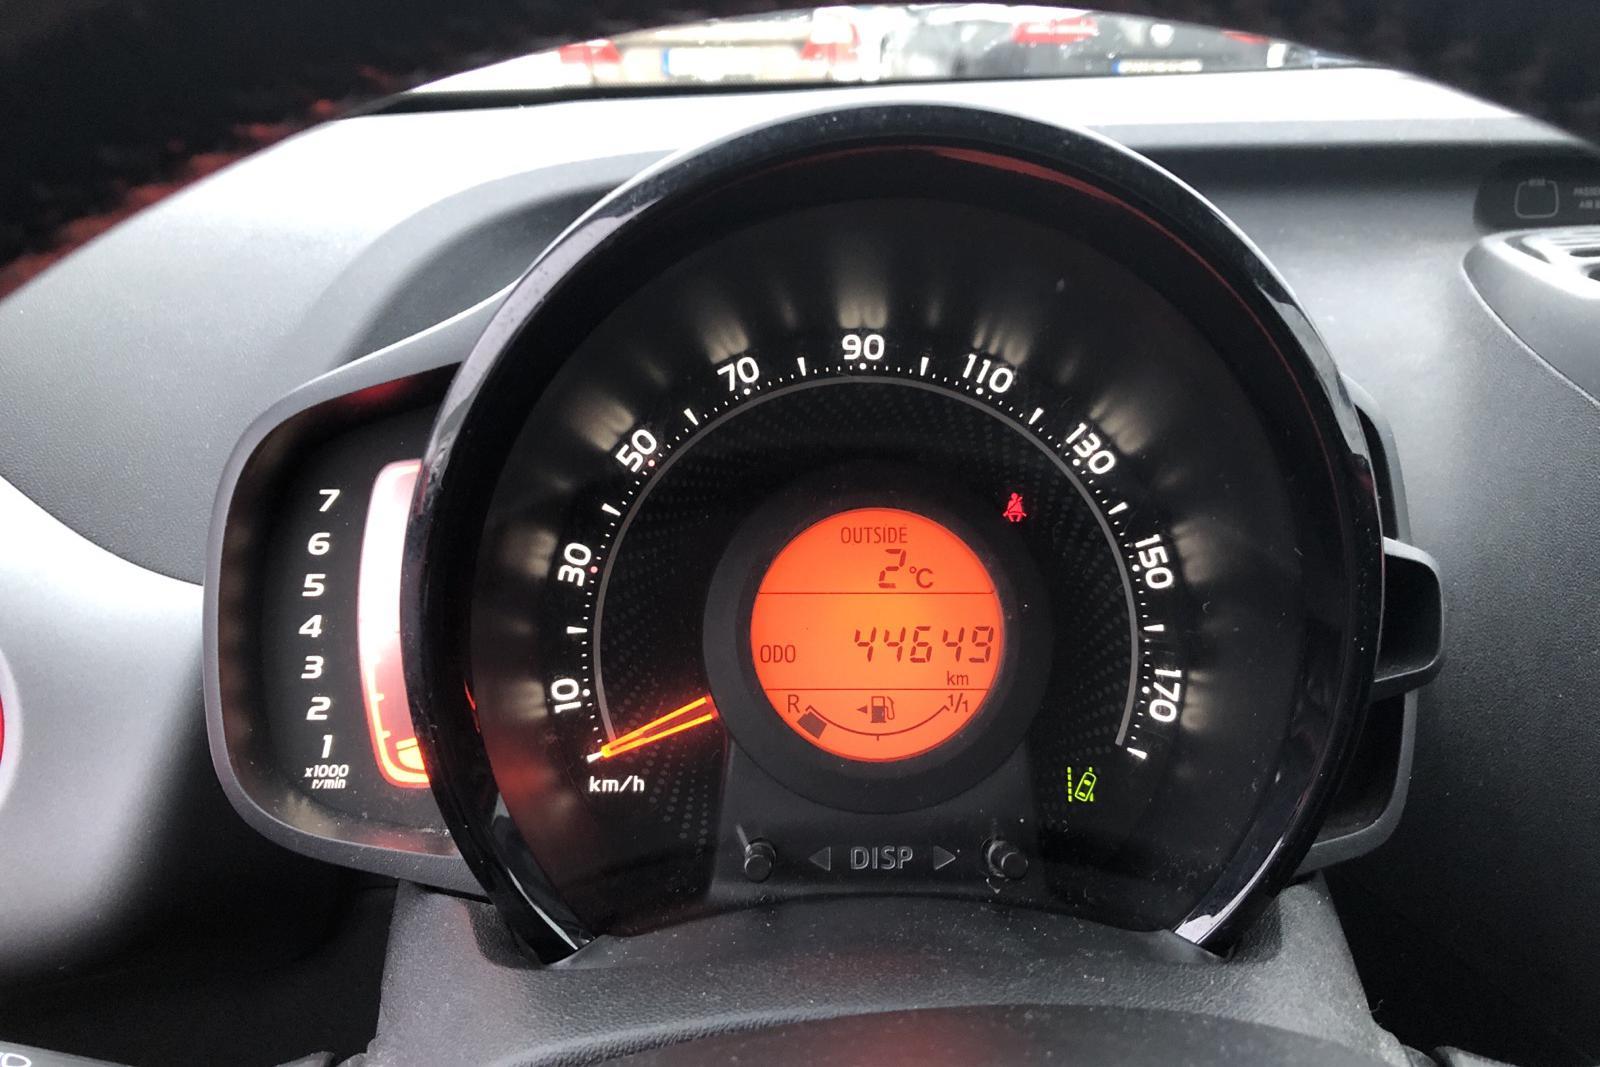 Toyota Aygo 1.0 5dr (72hk) - 4 464 mil - Manuell - röd - 2019